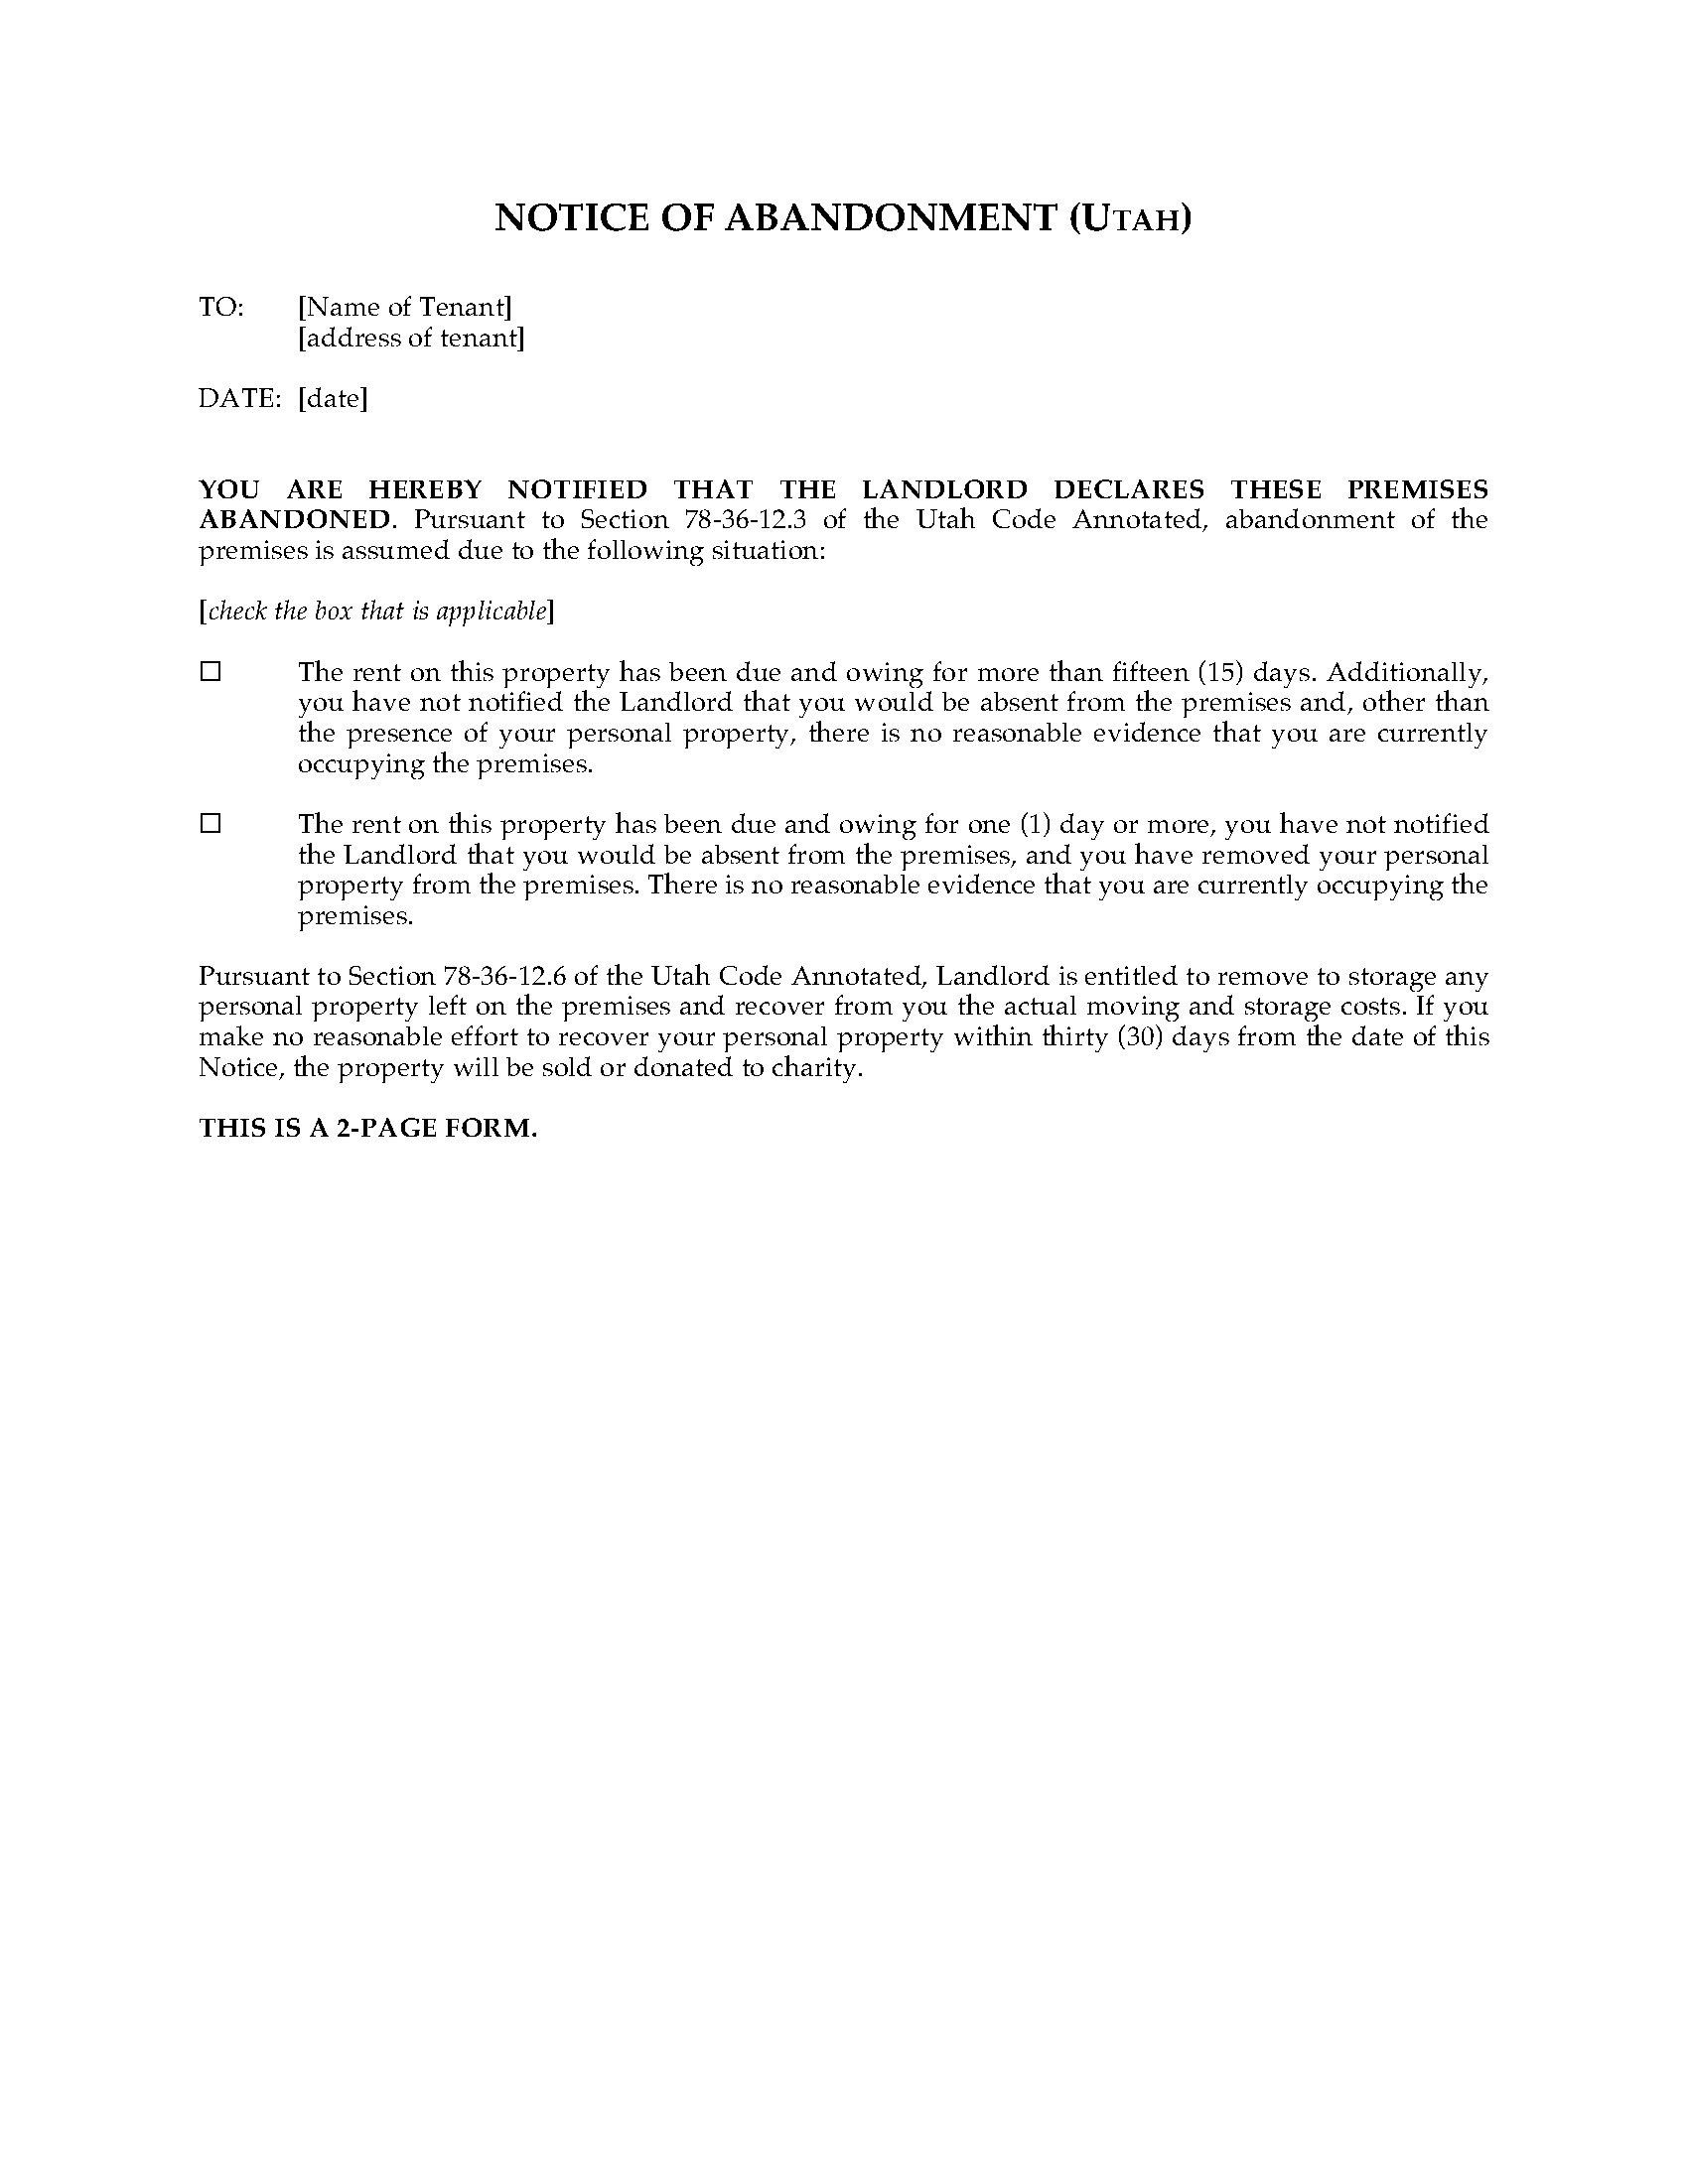 Utah Notice Of Abandonment